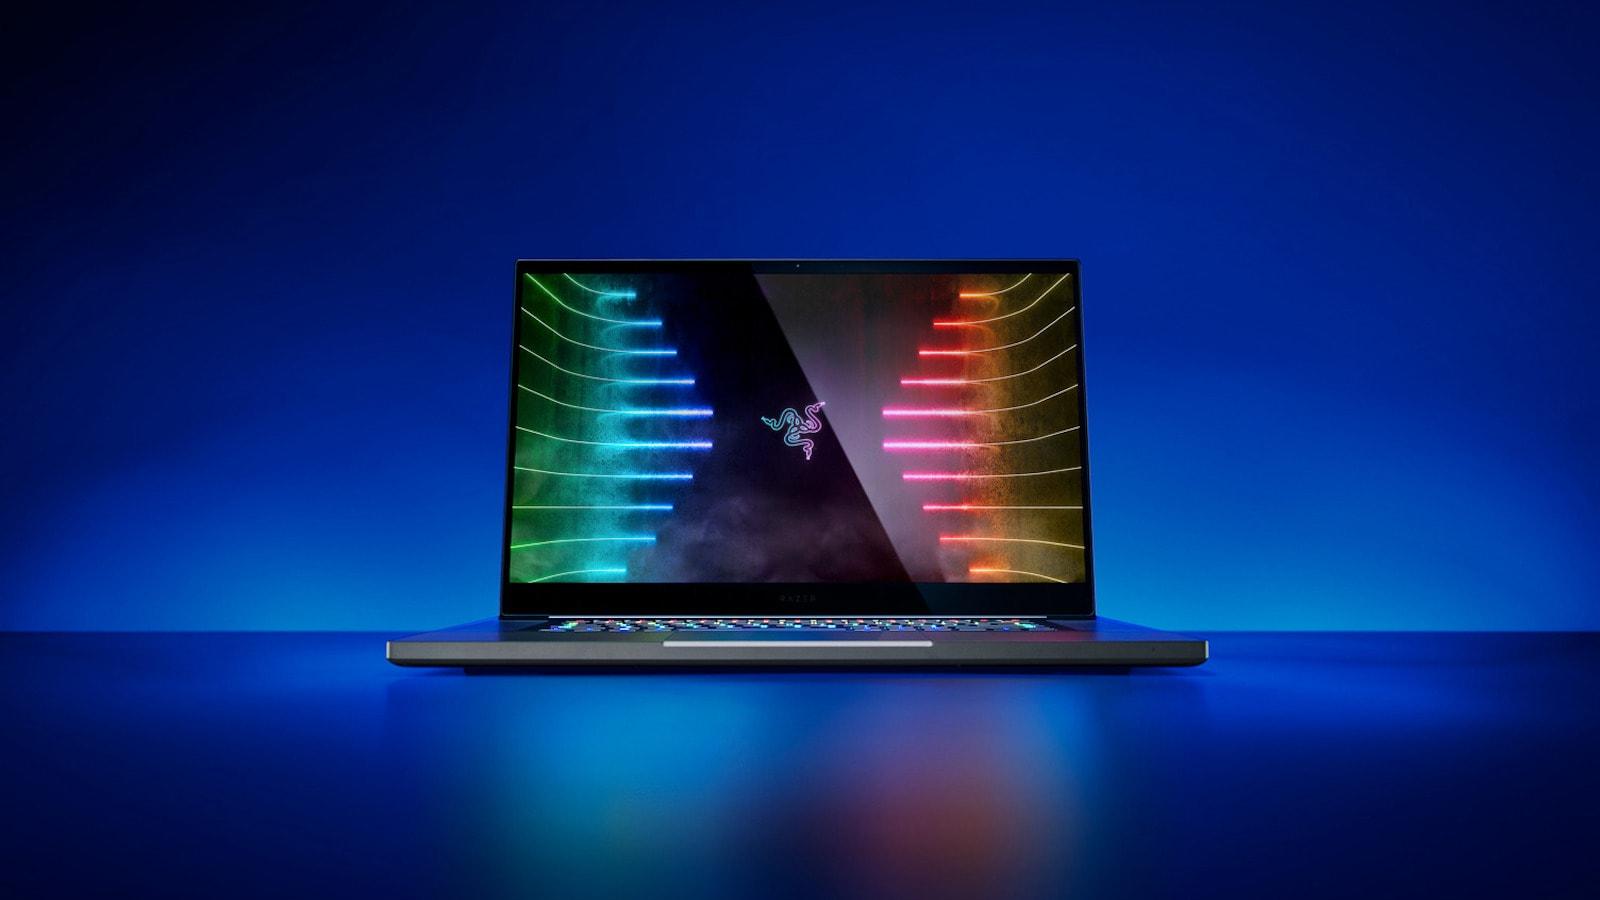 Razer Blade Pro 17 2021 gaming laptop has a super smooth 360 Hz FHD screen